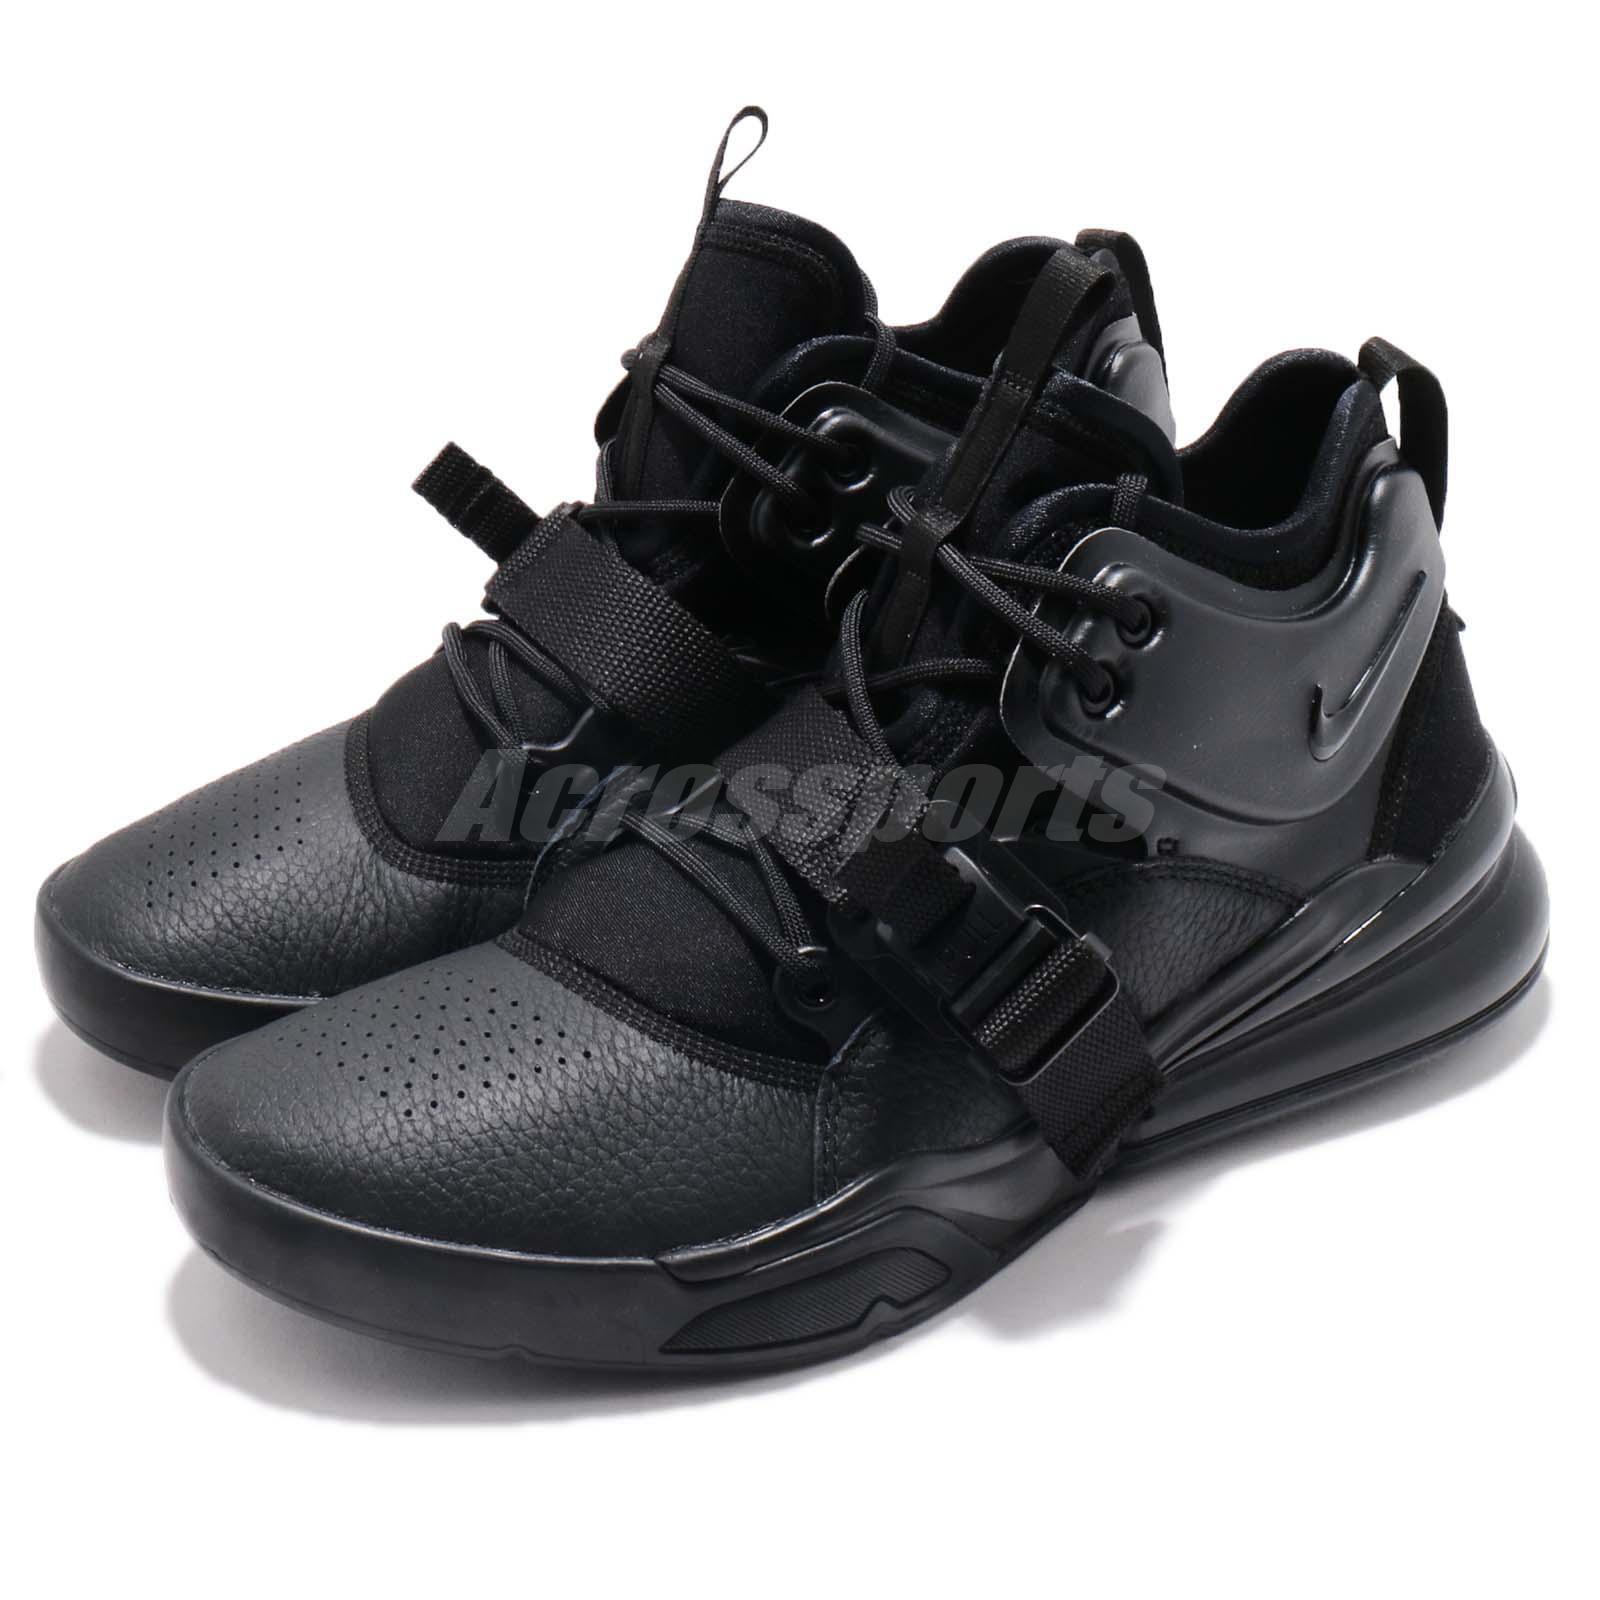 Nike air force 270 - schwarze lifestyle casual schuhen ah6772-010 turnschuhe ah6772-010 schuhen 5d3b84